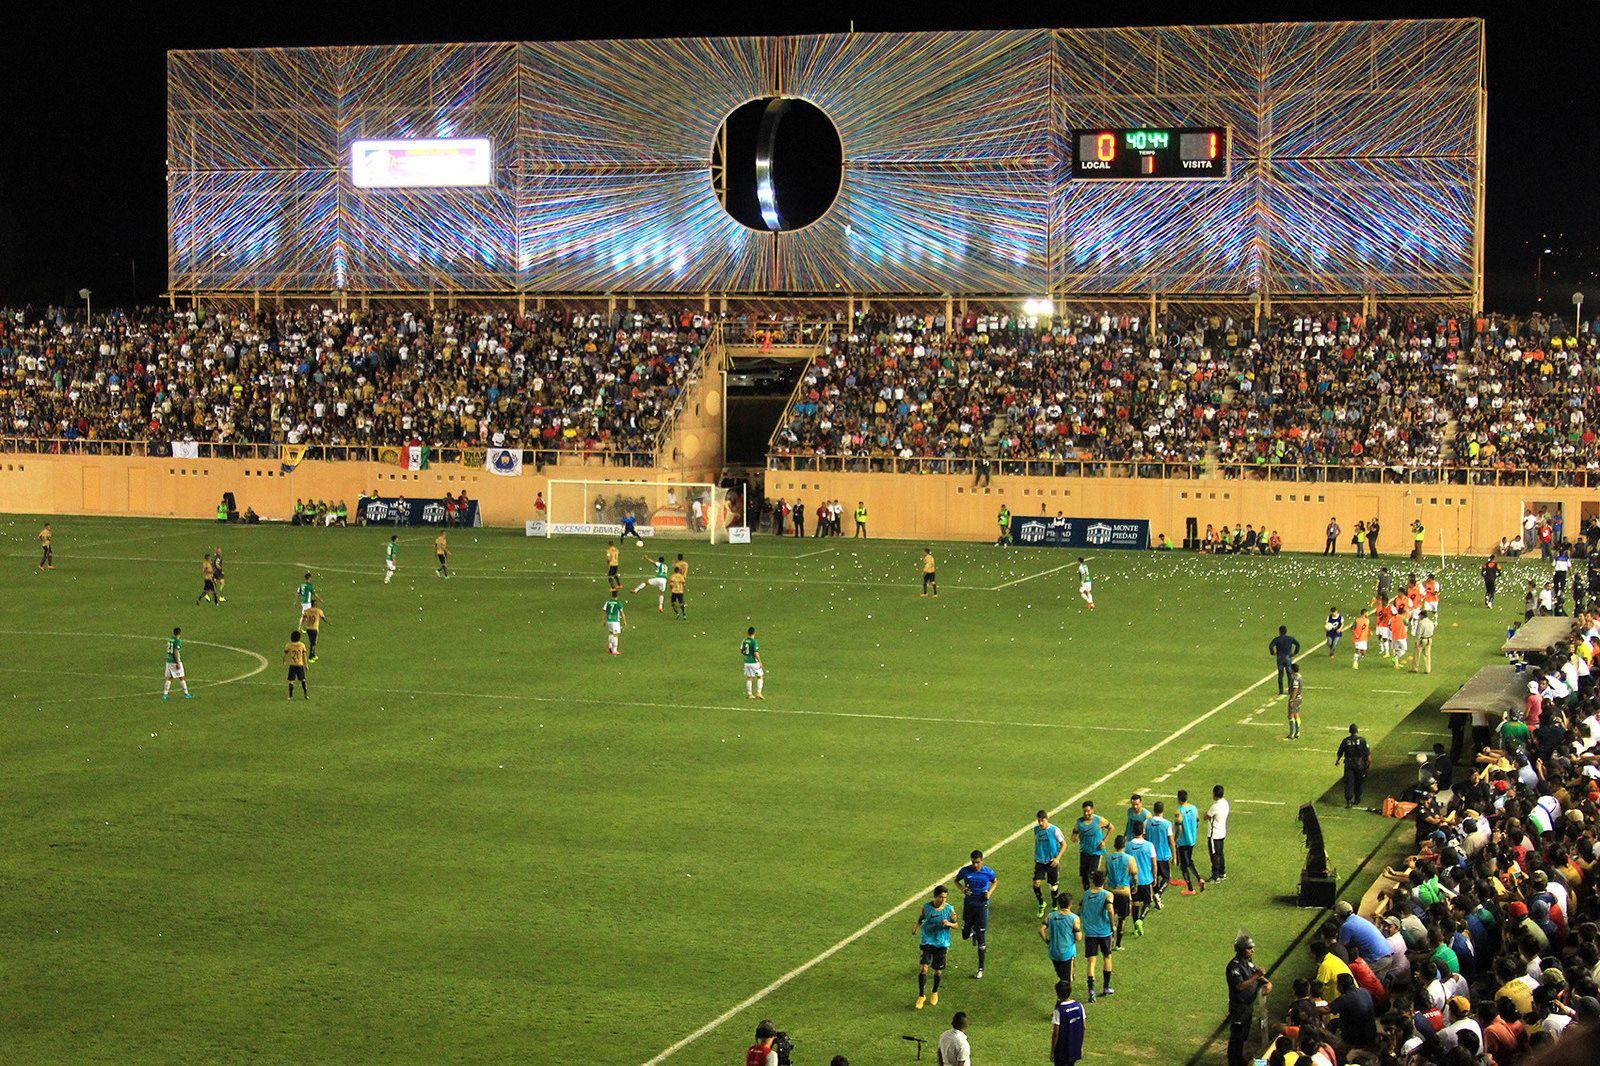 estadio_tecnologico_oaxaca13